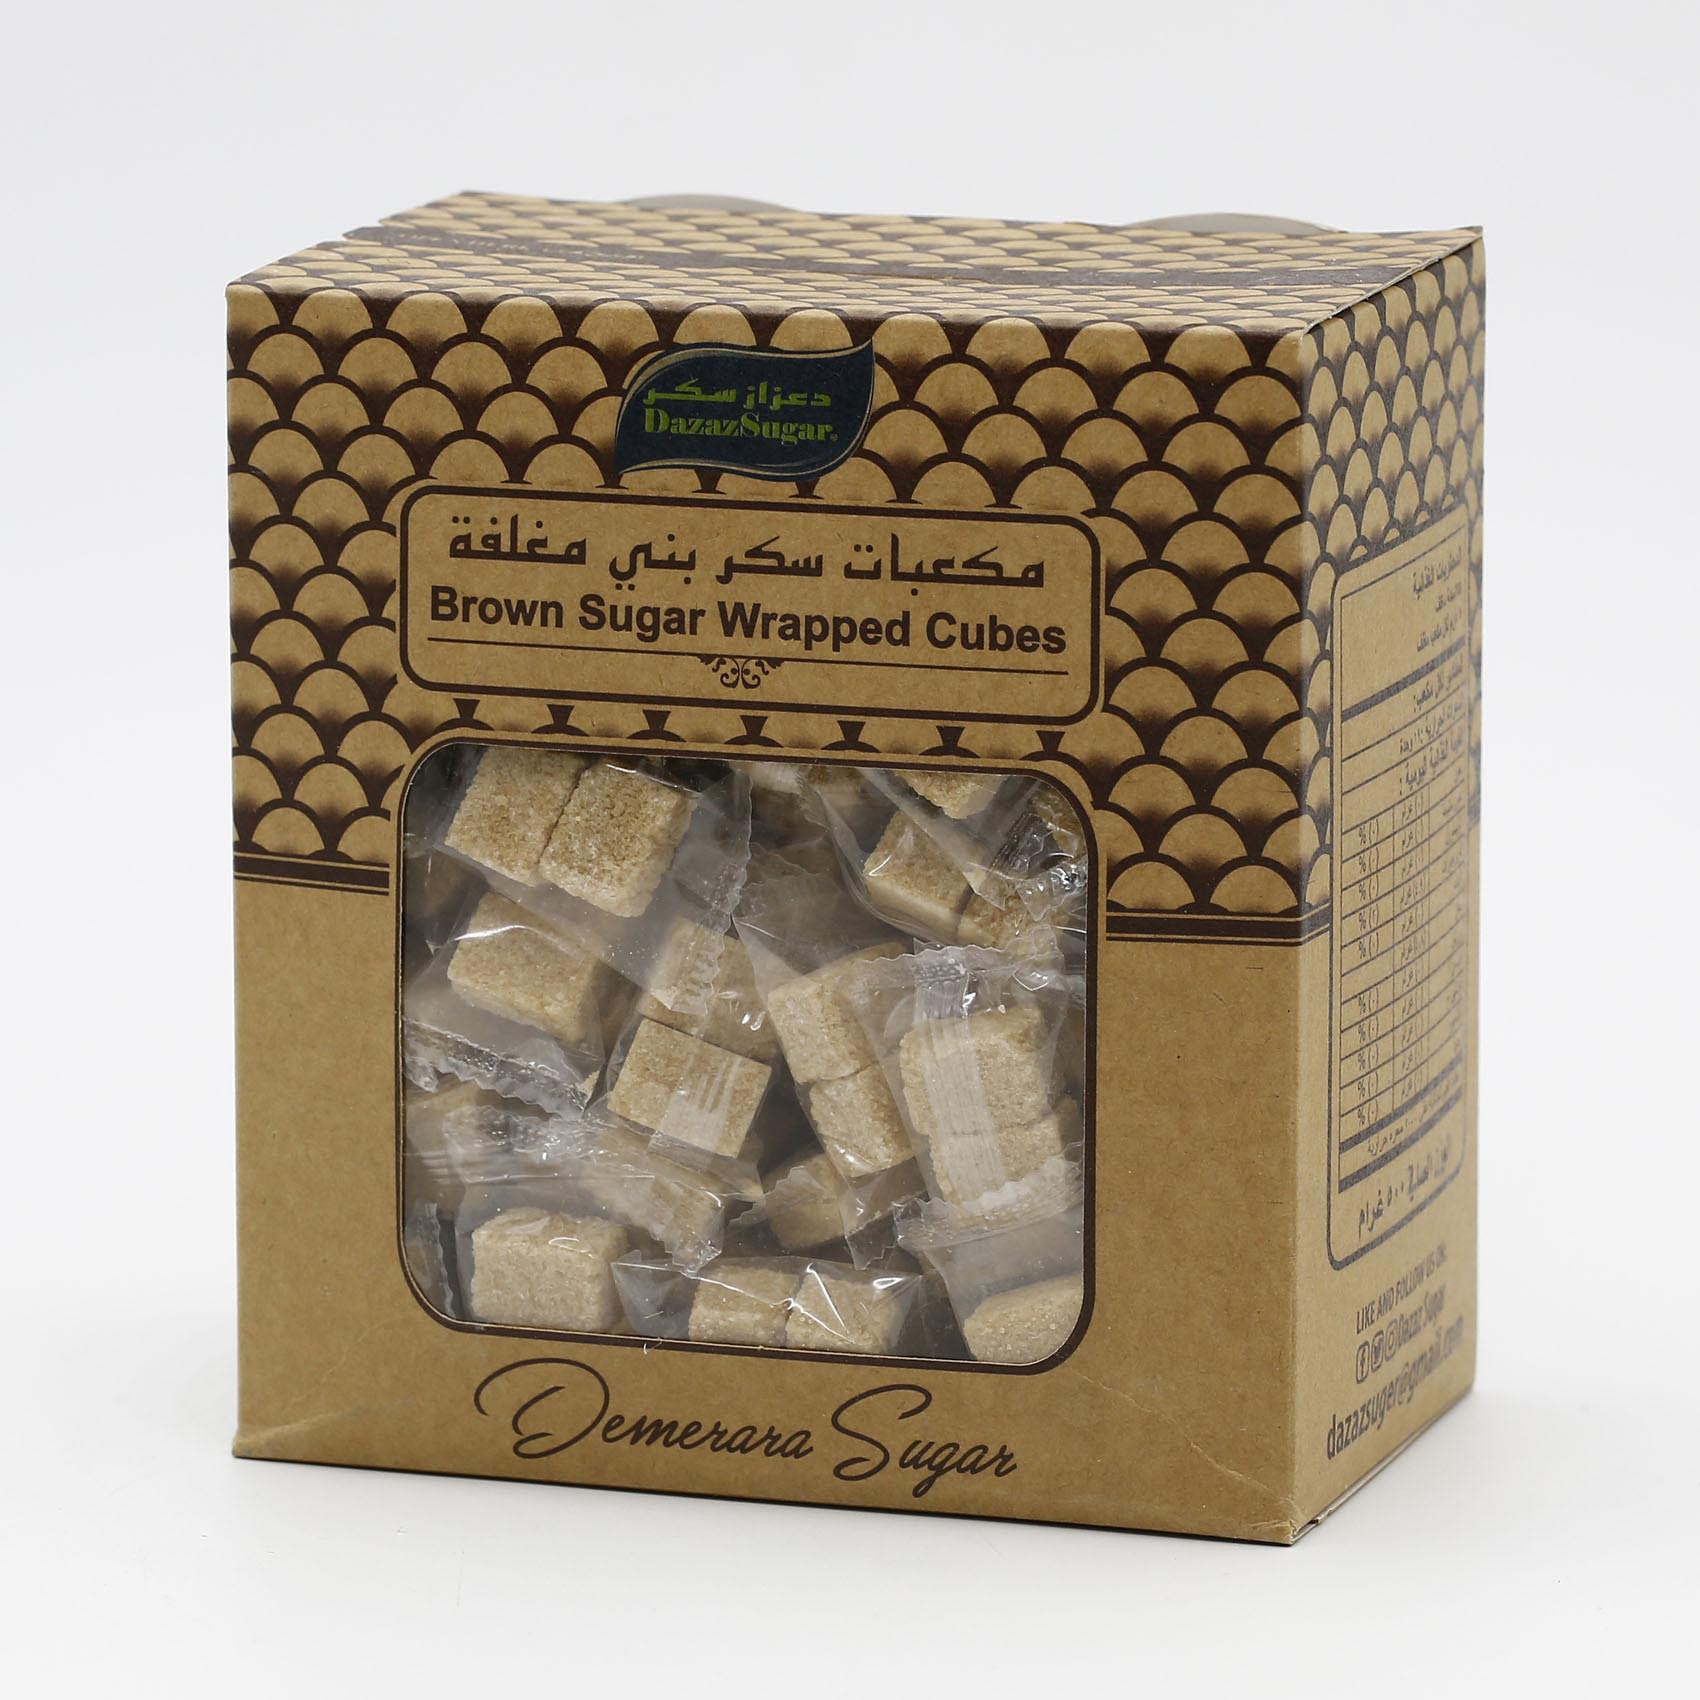 Buy Dazaz Brown Sugar Wrapped Cubes 500 G Online Shop Food Cupboard On Carrefour Saudi Arabia